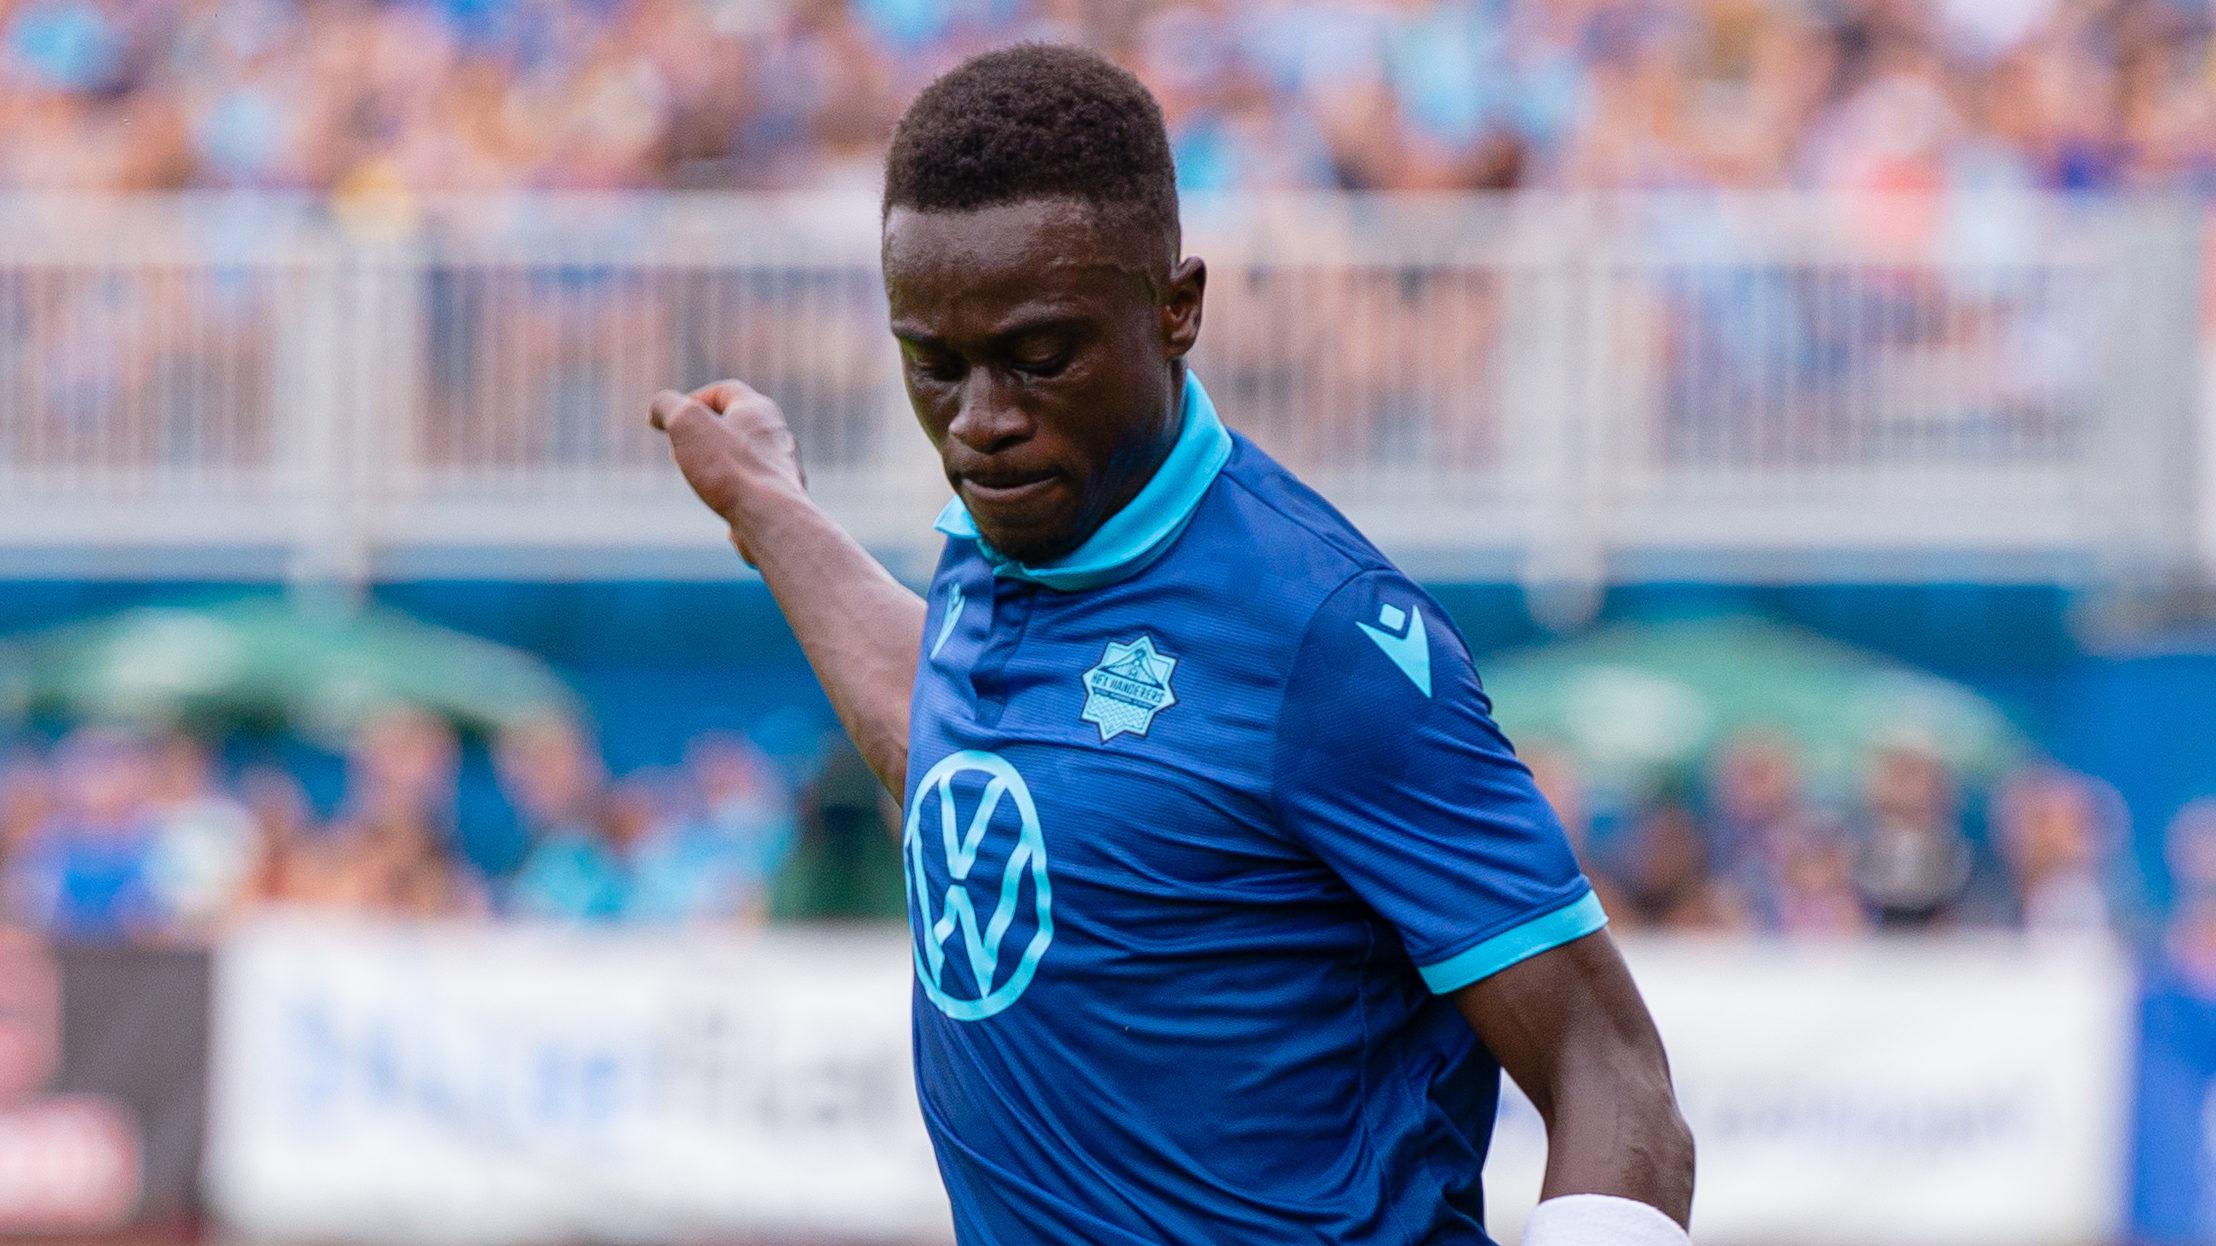 HFX Wanderers FC midfielder Mohammad Kourouma. (Trevor MacMillan/CPL).